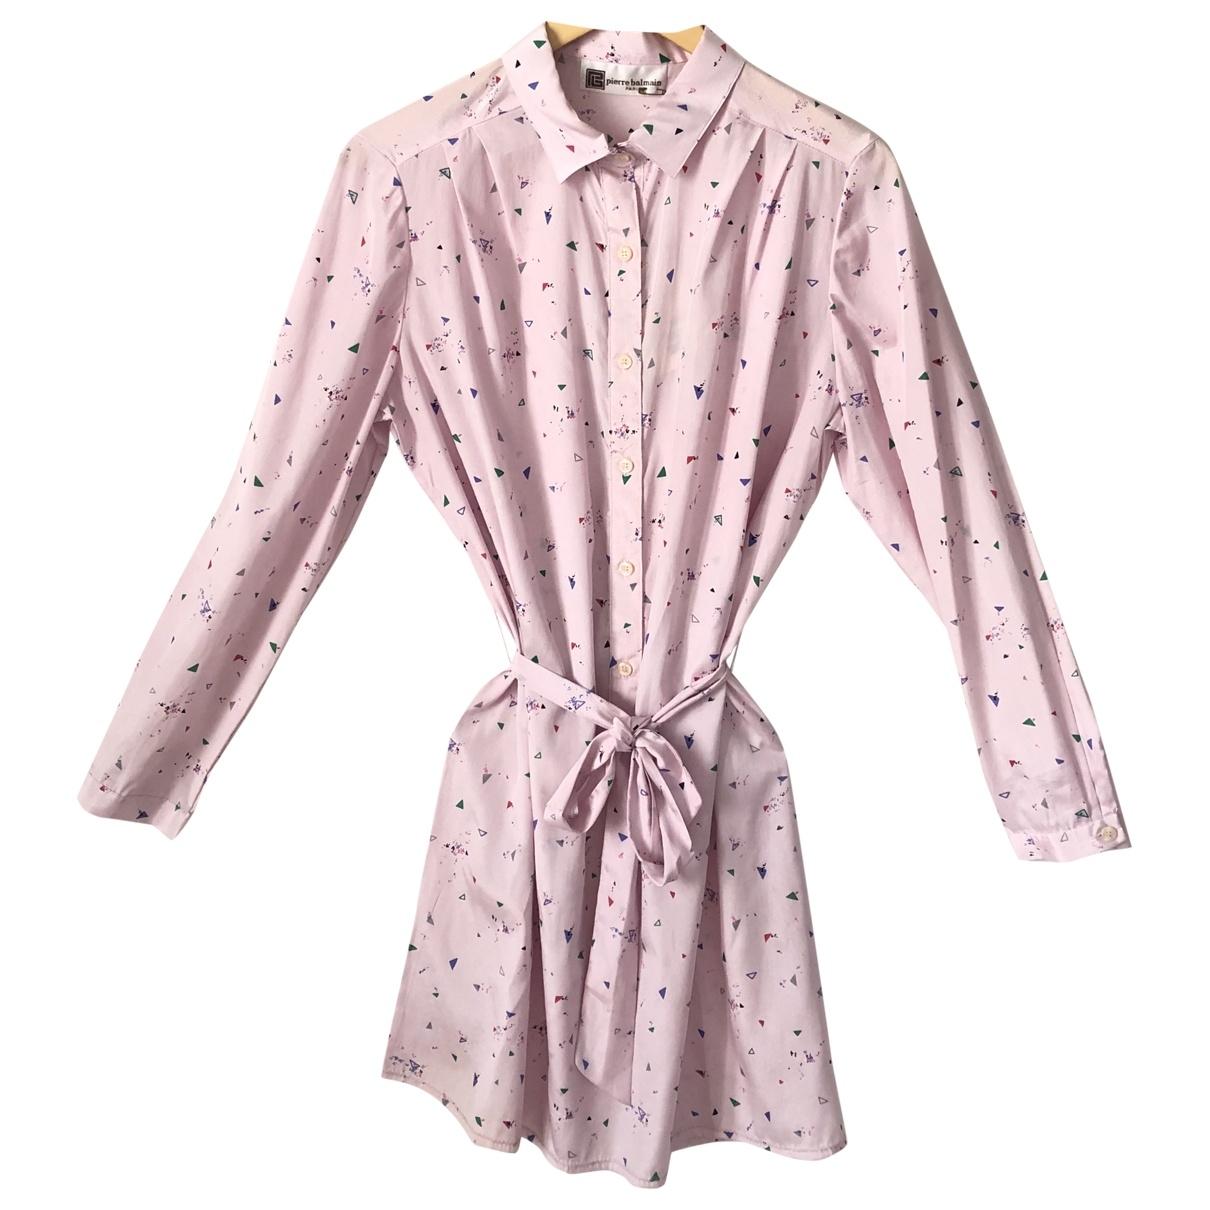 Pierre Balmain \N Pink dress for Women S International